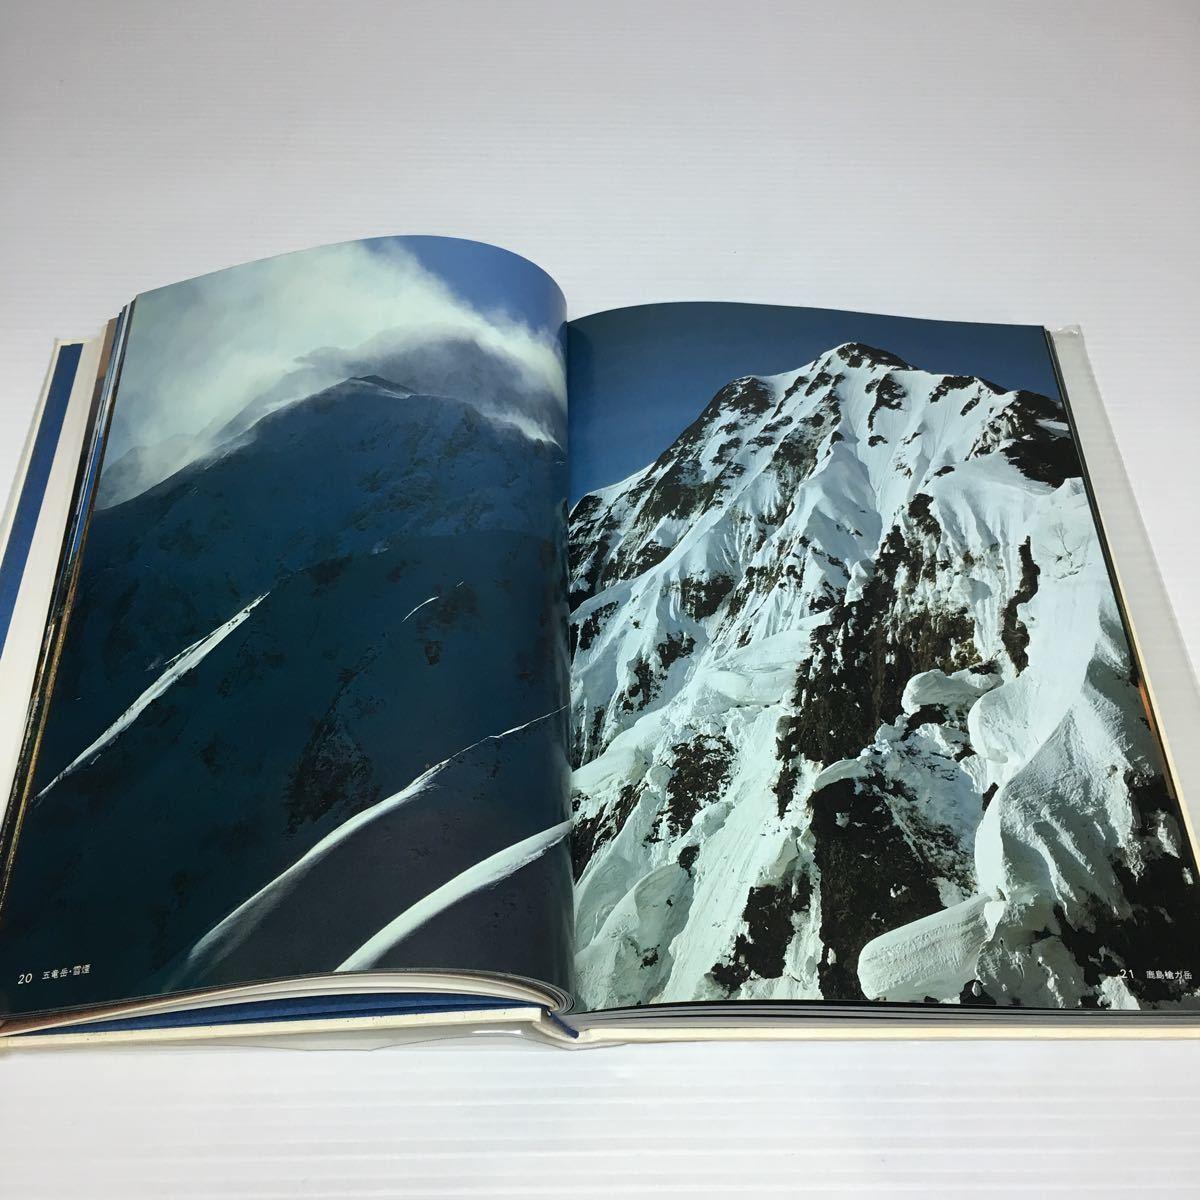 x2/北アルプス 日本山岳写真集団 昭和54年初版 定価8000円_画像7